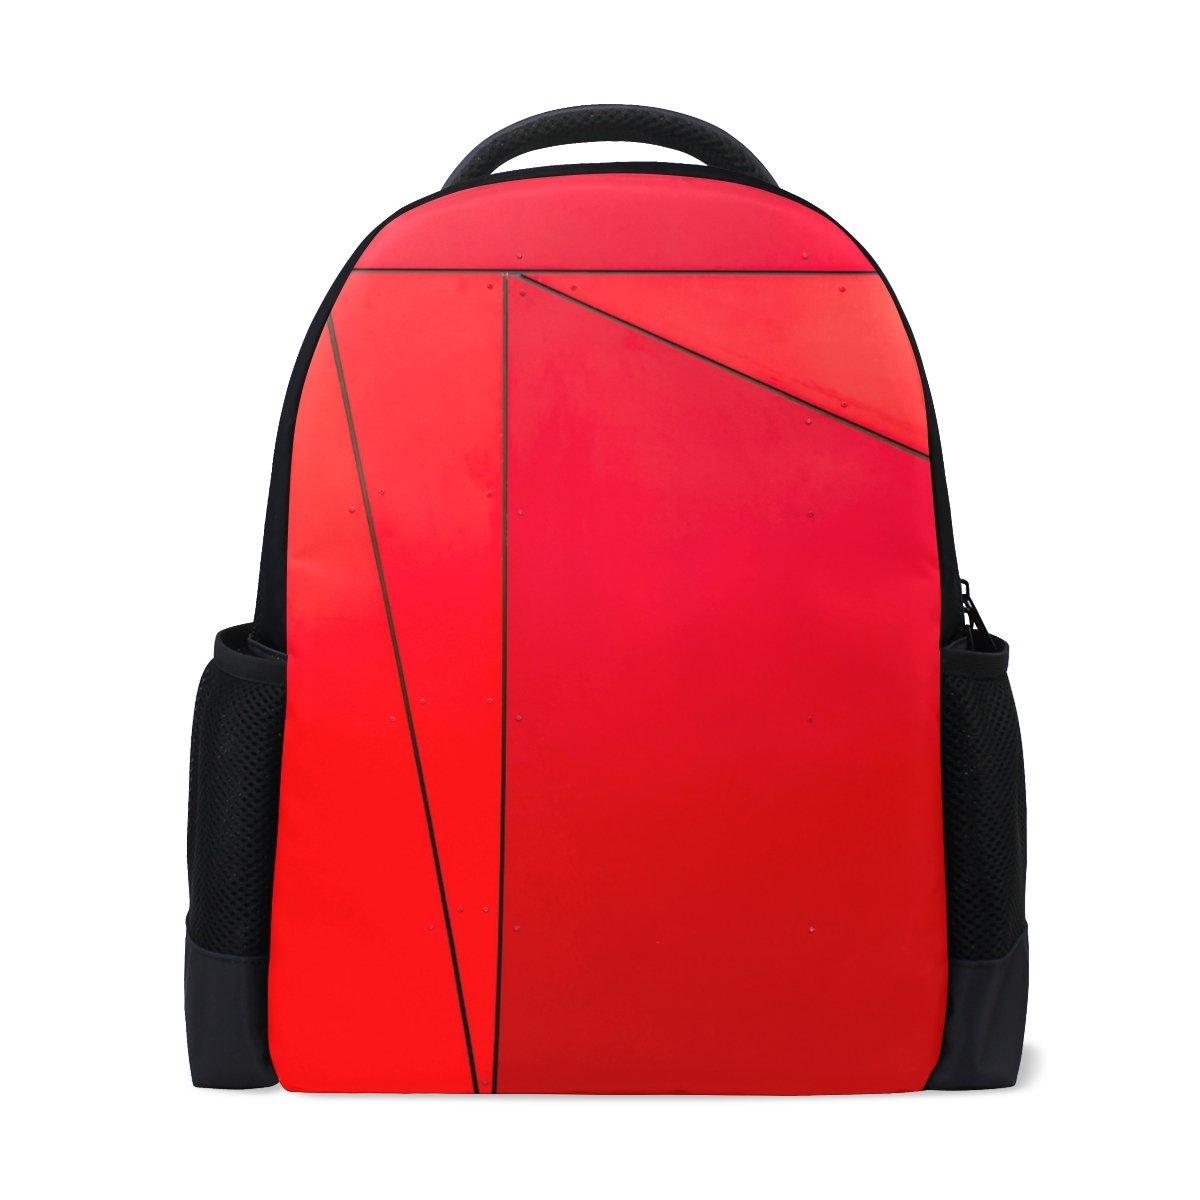 a188ab3c18a7 delicate SAVSV Dacron Geometric Figure Fashion Backpack Laptop ...